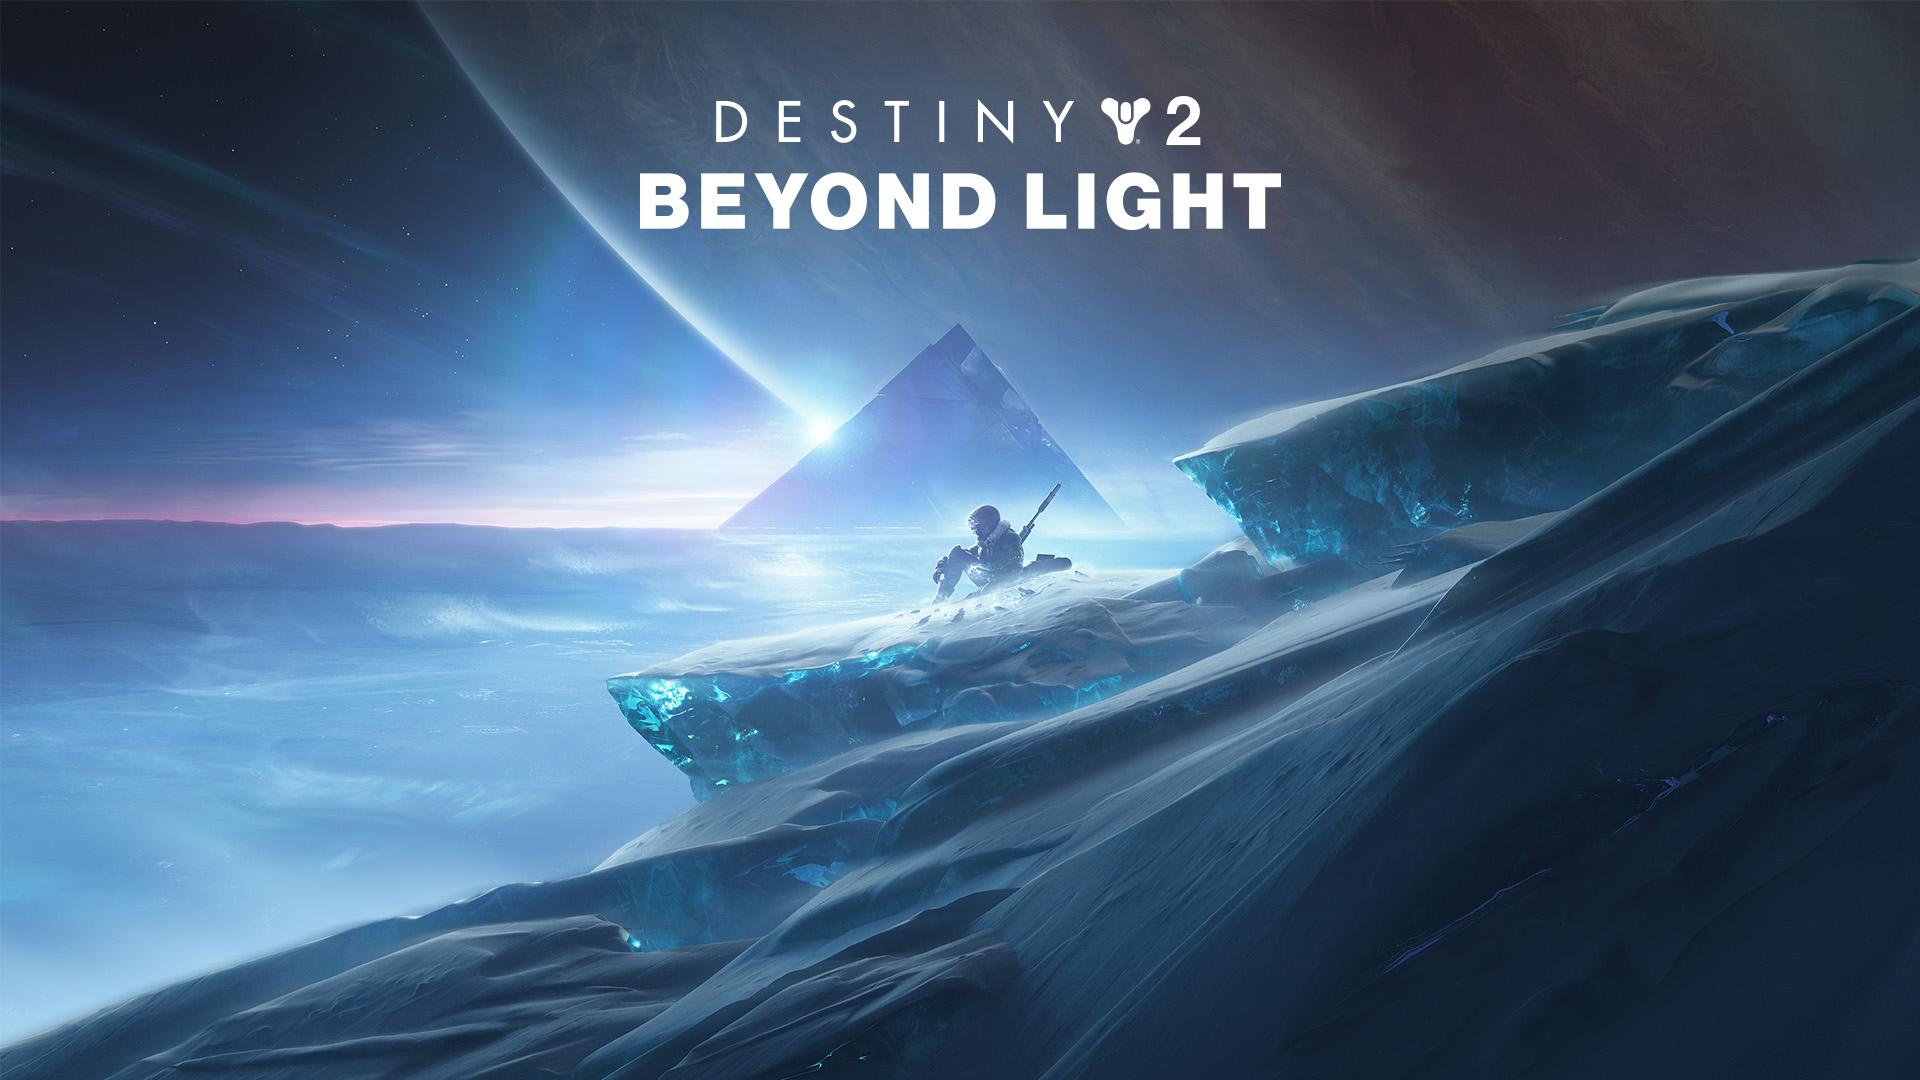 destiny 2 analysis